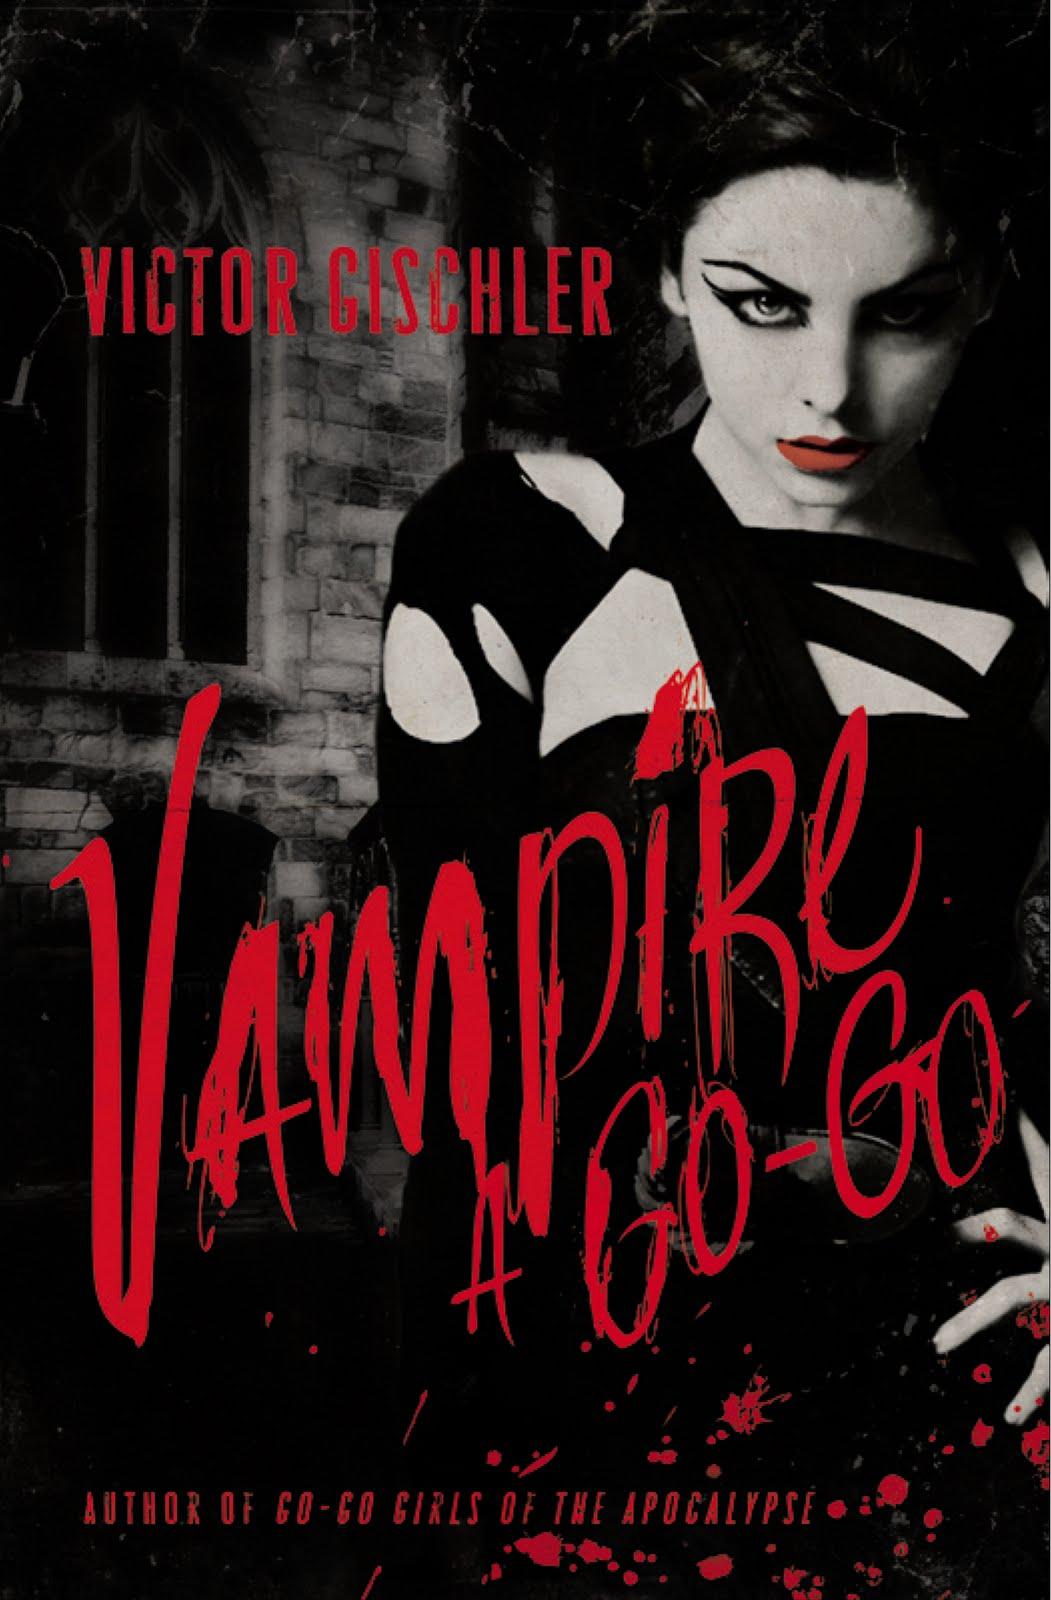 http://1.bp.blogspot.com/_hpkhoQ3mZUw/Sp3UVQkMPzI/AAAAAAAAAls/gwUg37eCiYY/s1600/vampire_a_go-go.jpg